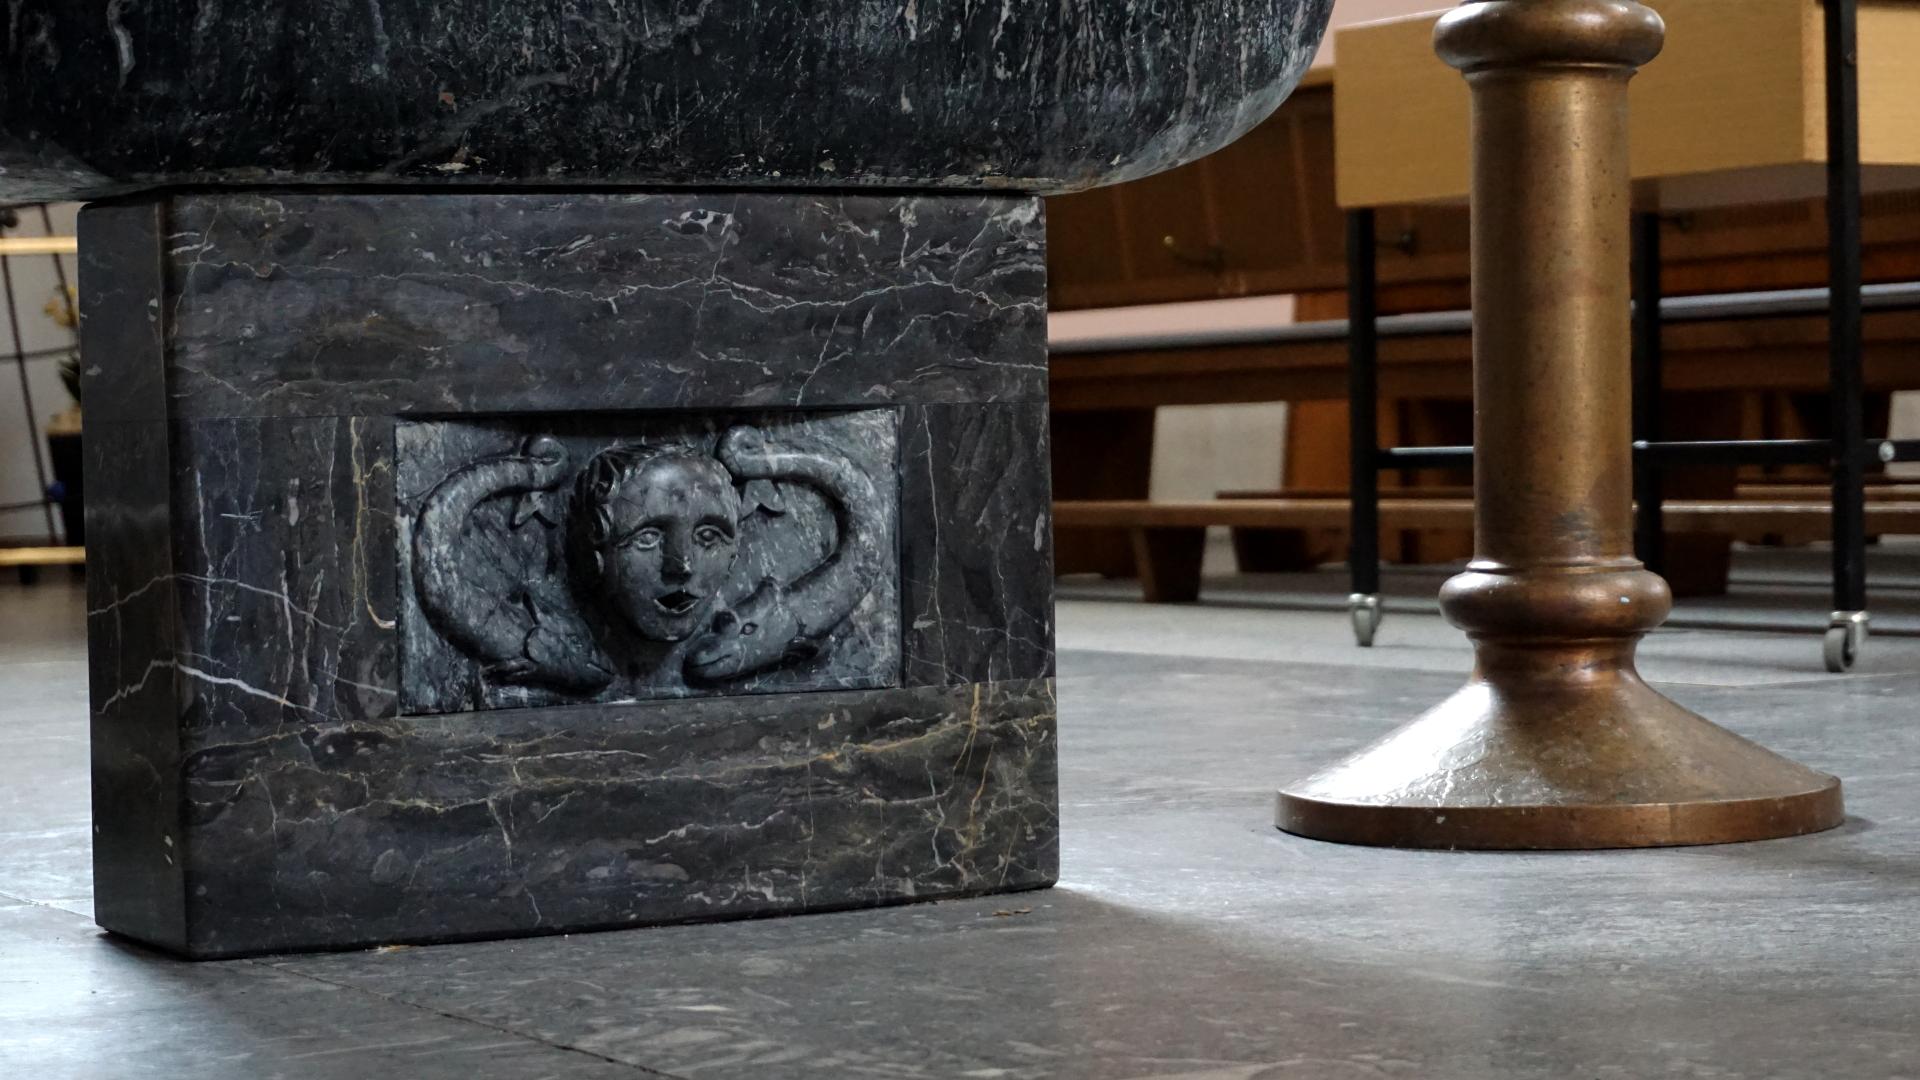 Fuß des Taufsteins in St. Clemens, Hannover — Experiment